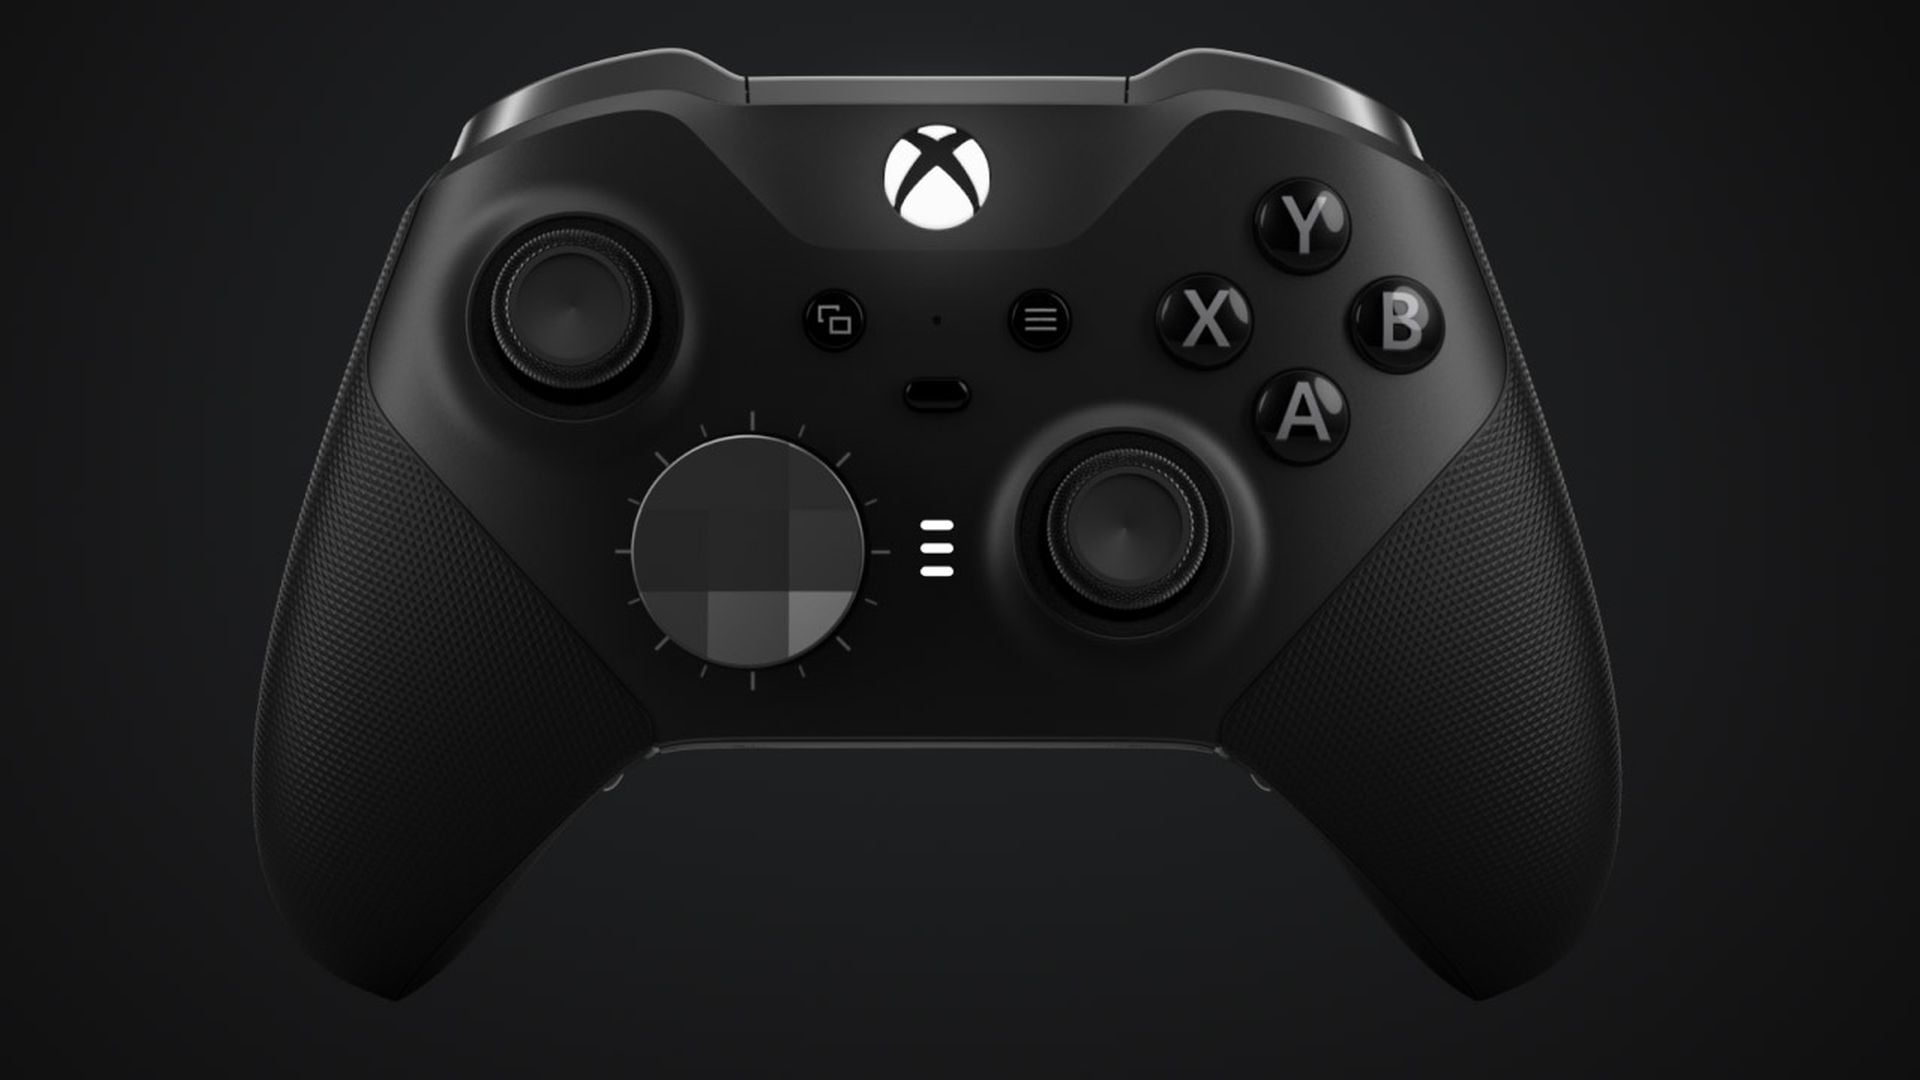 xbox one 控件:所有将兼容xbox 系列x | 103b3567 gjgbdns | 已婚游戏新闻| Xbox One 控件